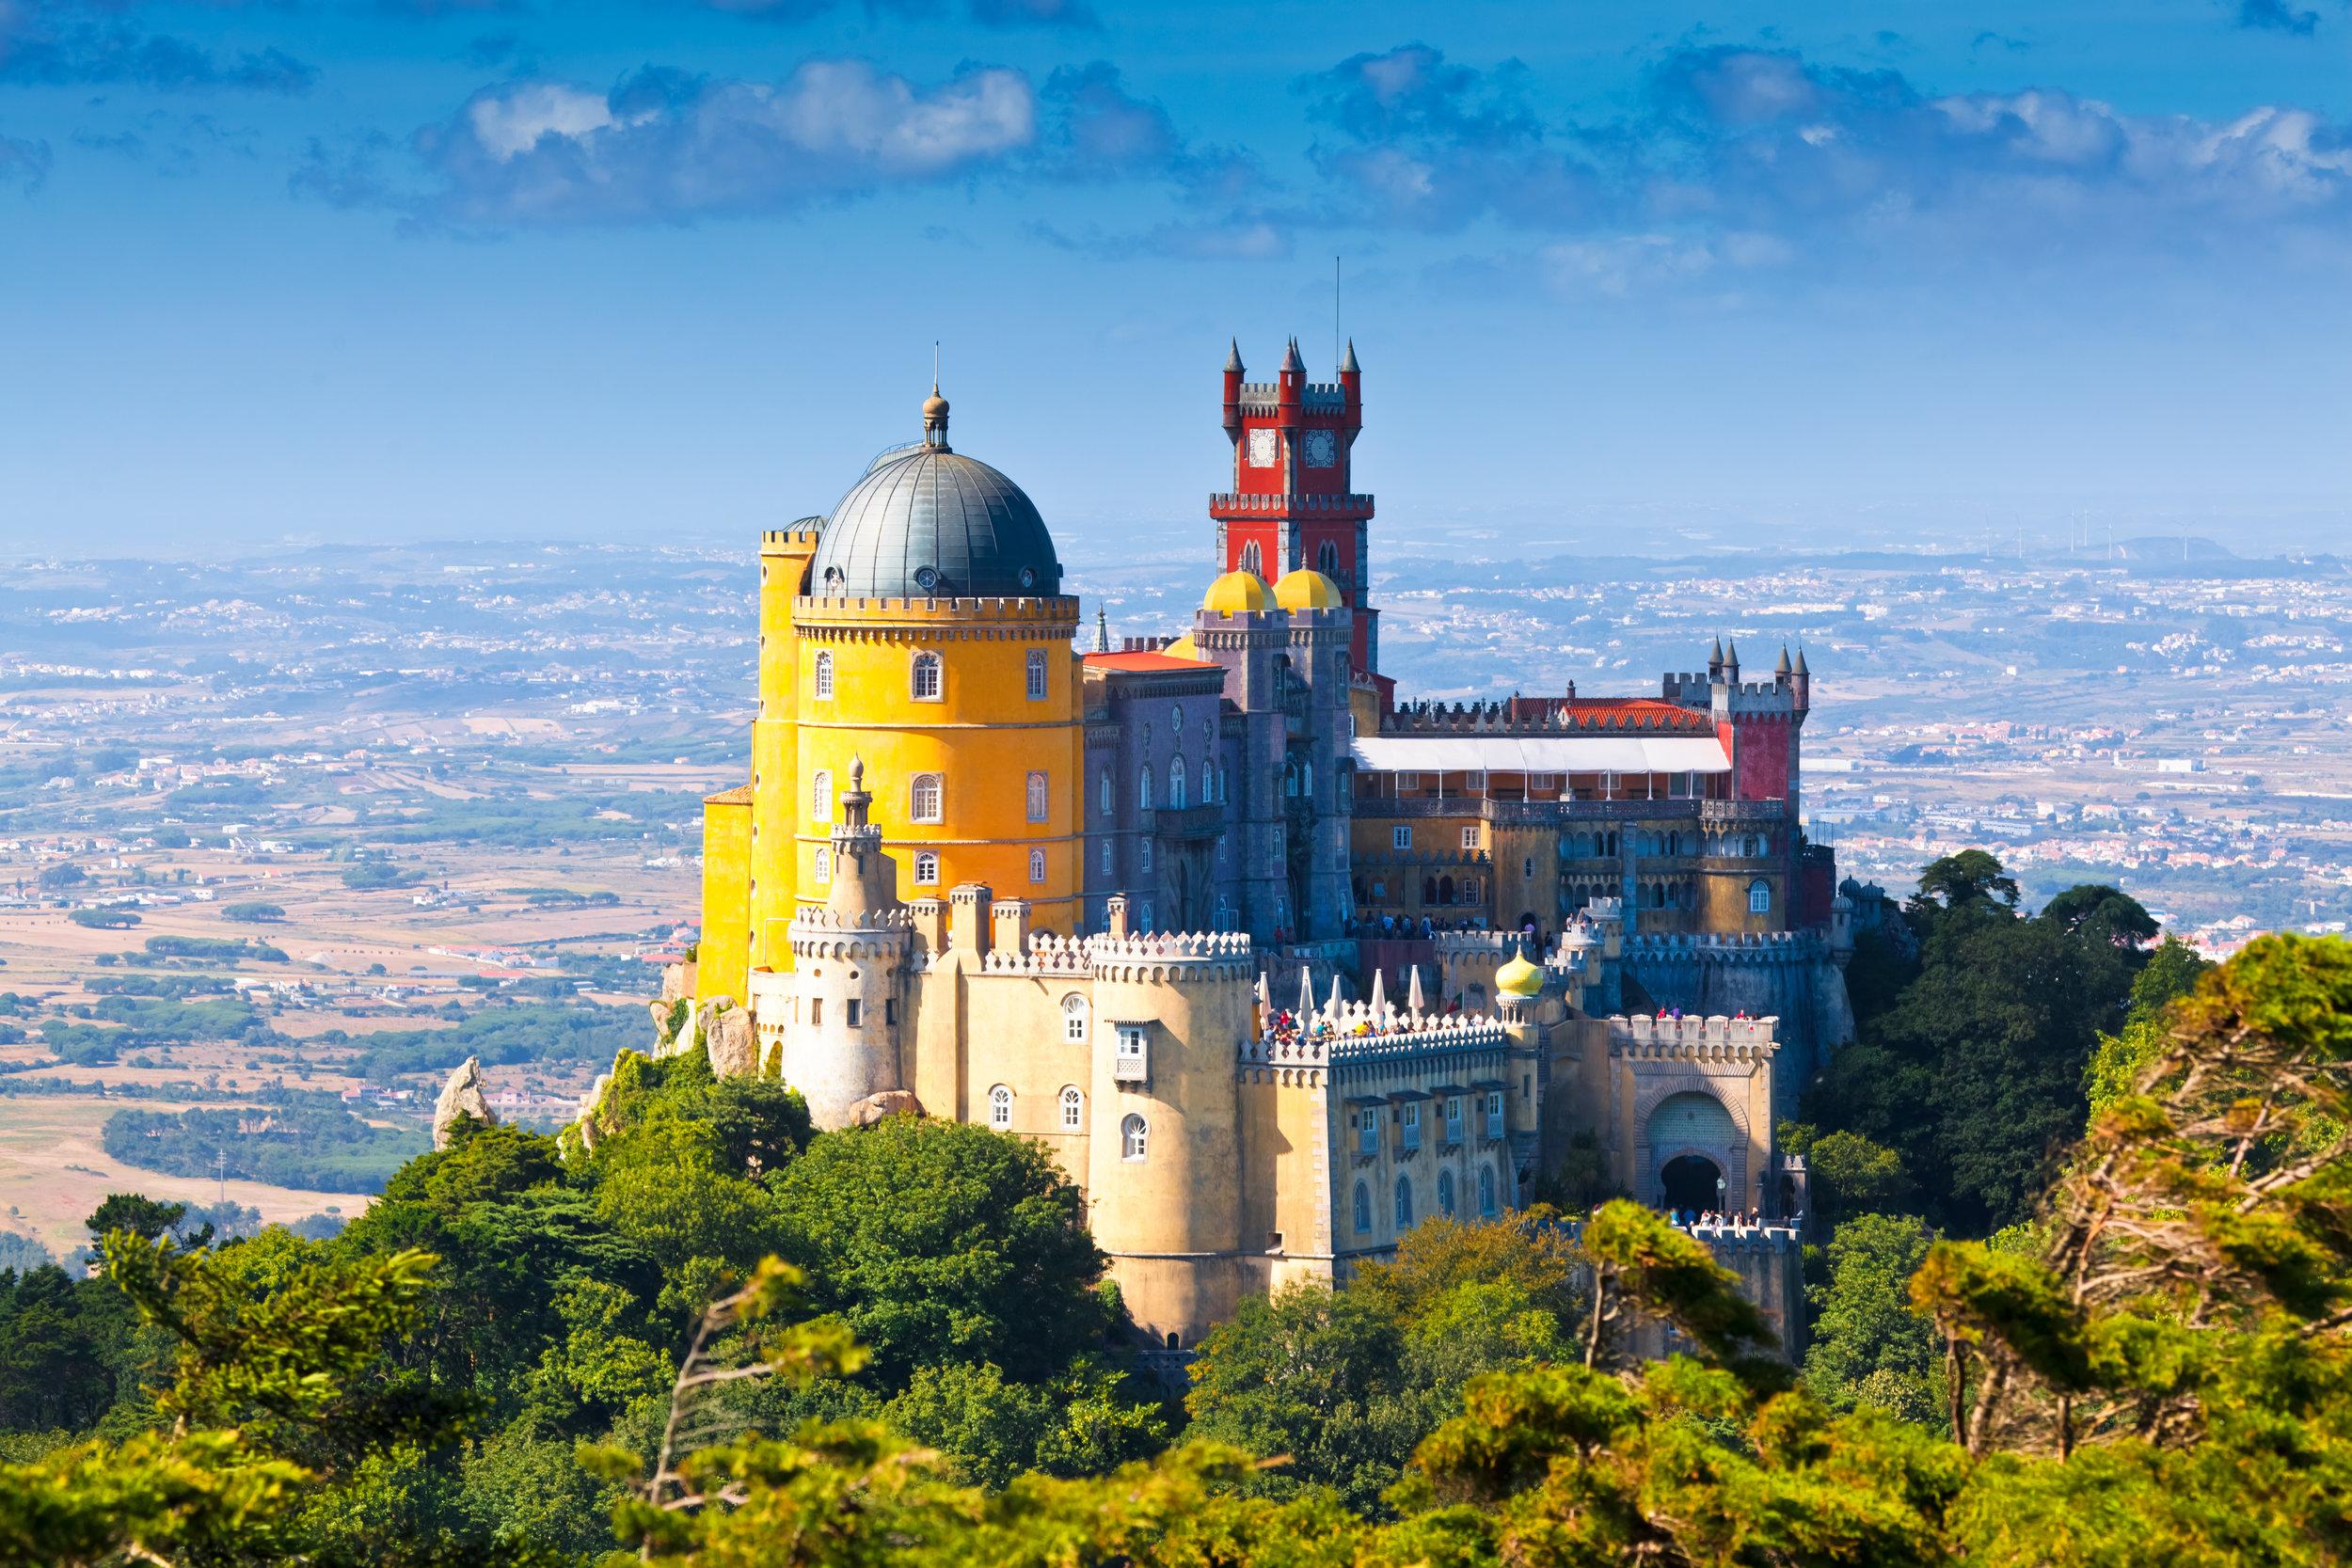 bigstock-Sintra-Portugal-24167201.jpg